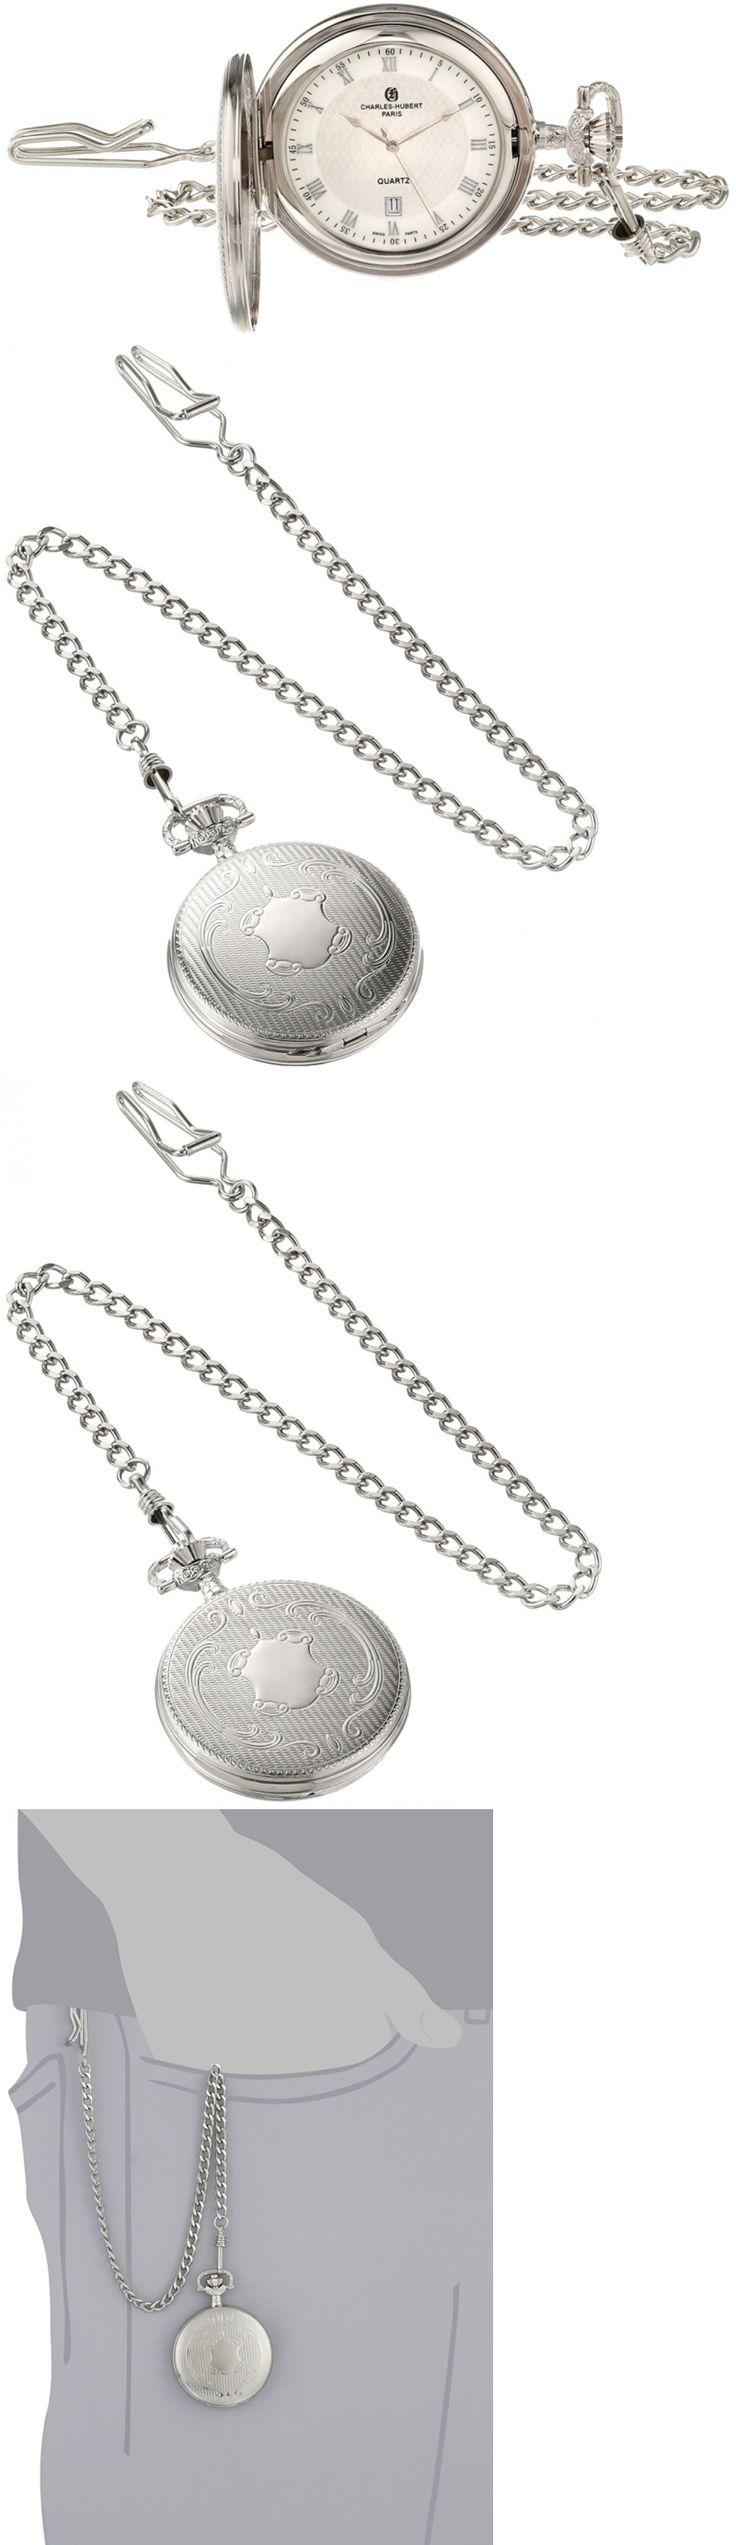 Modern 3938: Charles-Hubert, Paris Quartz Pocket Watch -> BUY IT NOW ONLY: $92.99 on eBay!